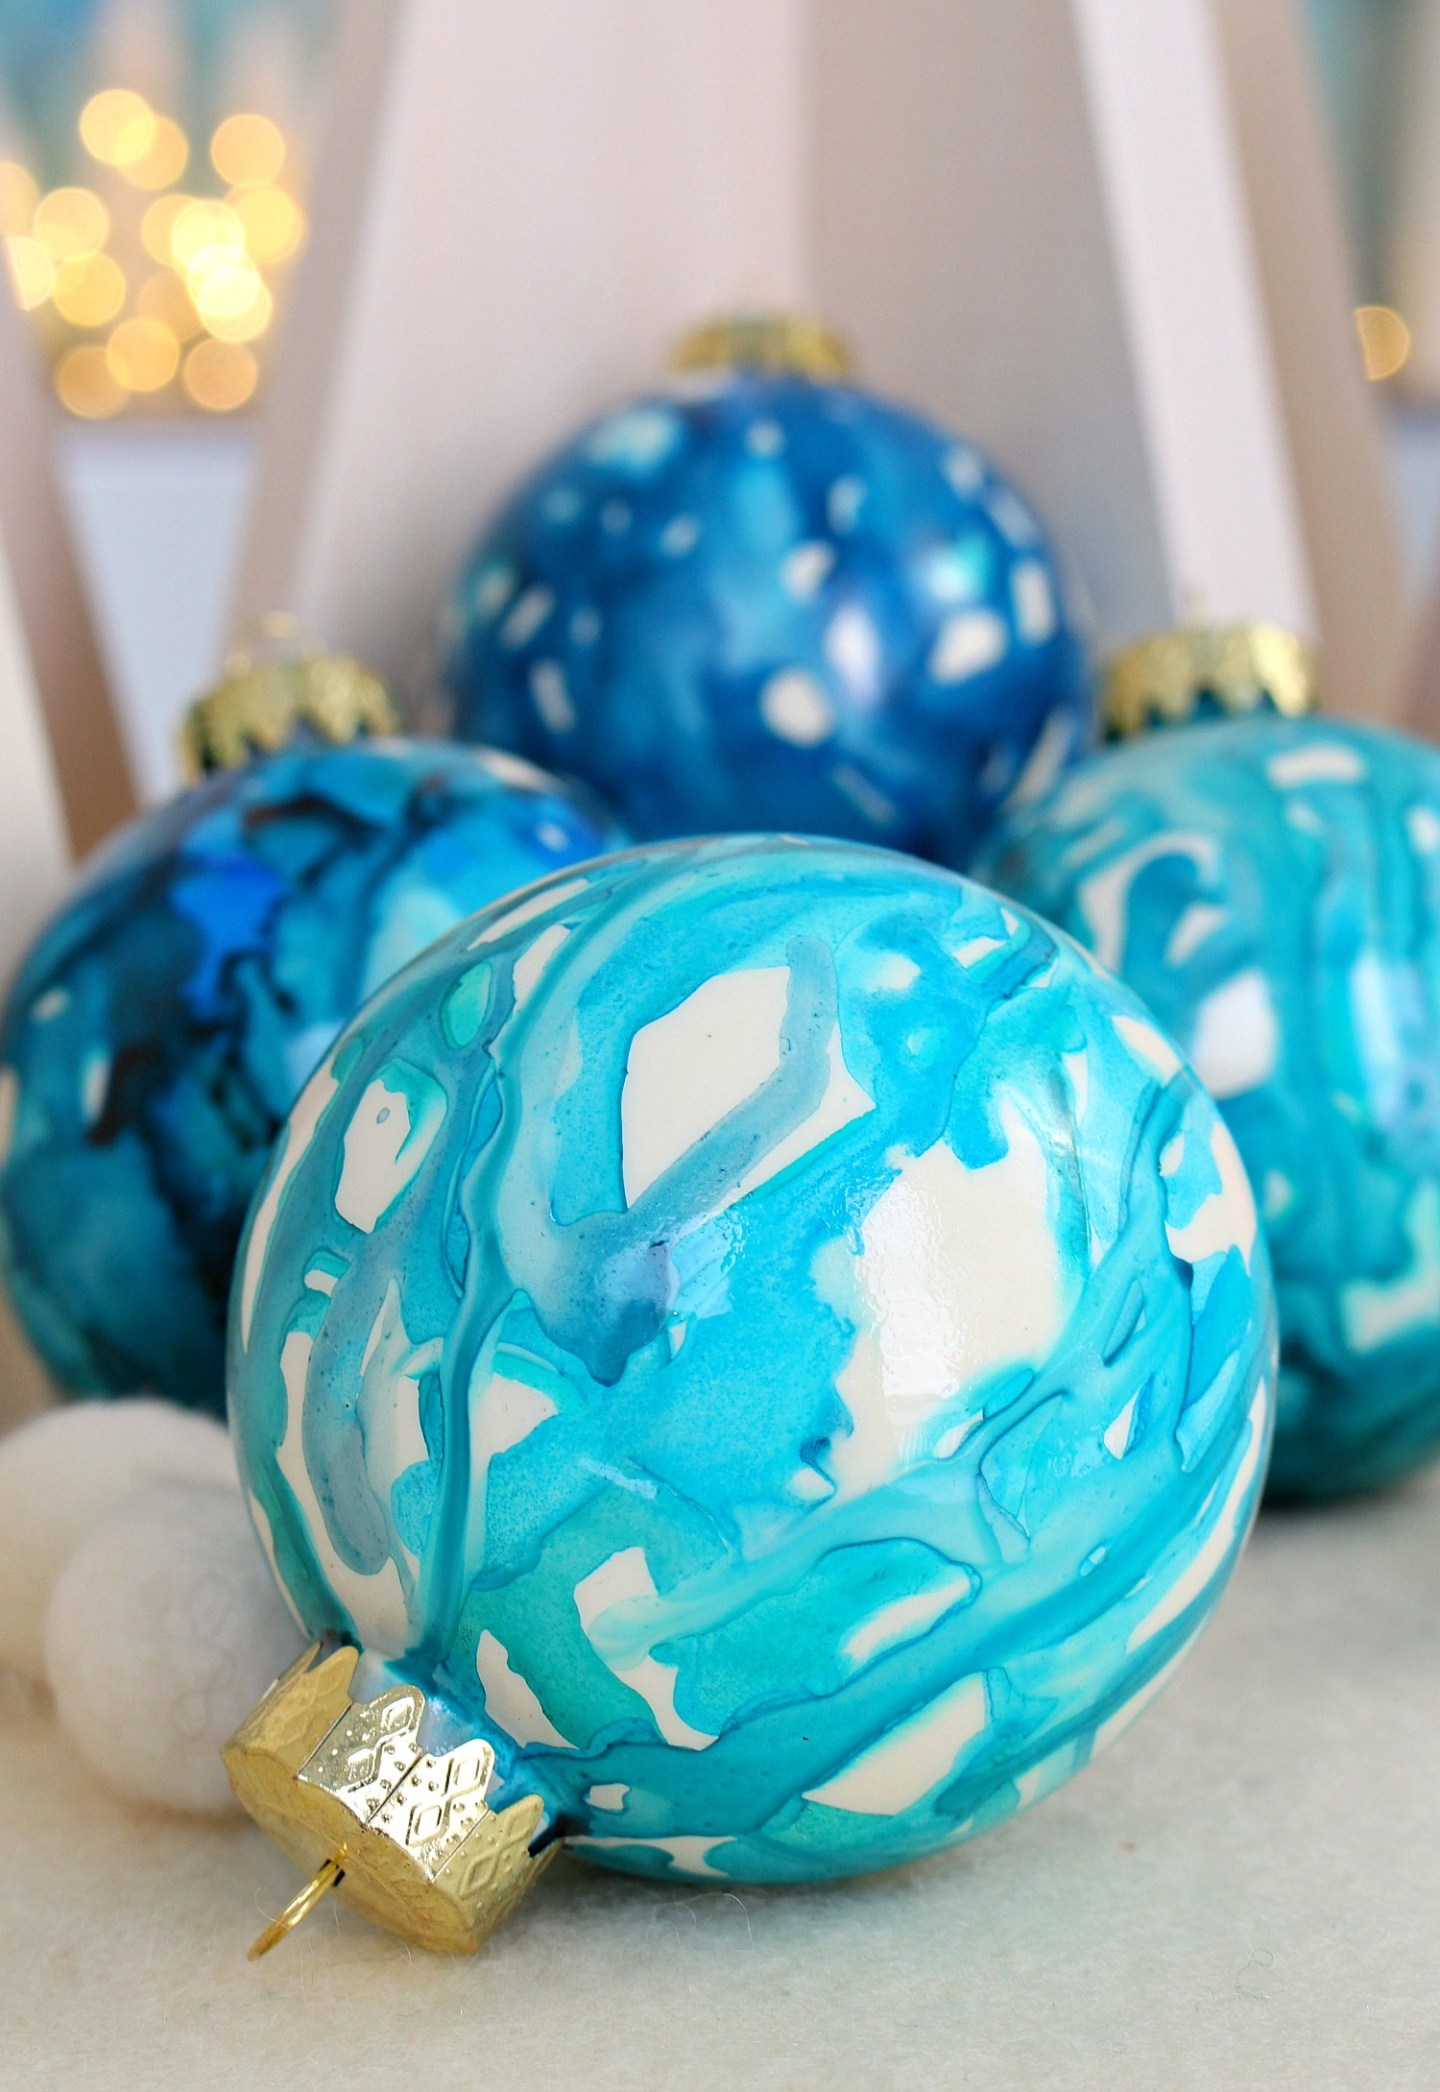 Easy DIY Tree Ornament Kids Can Make